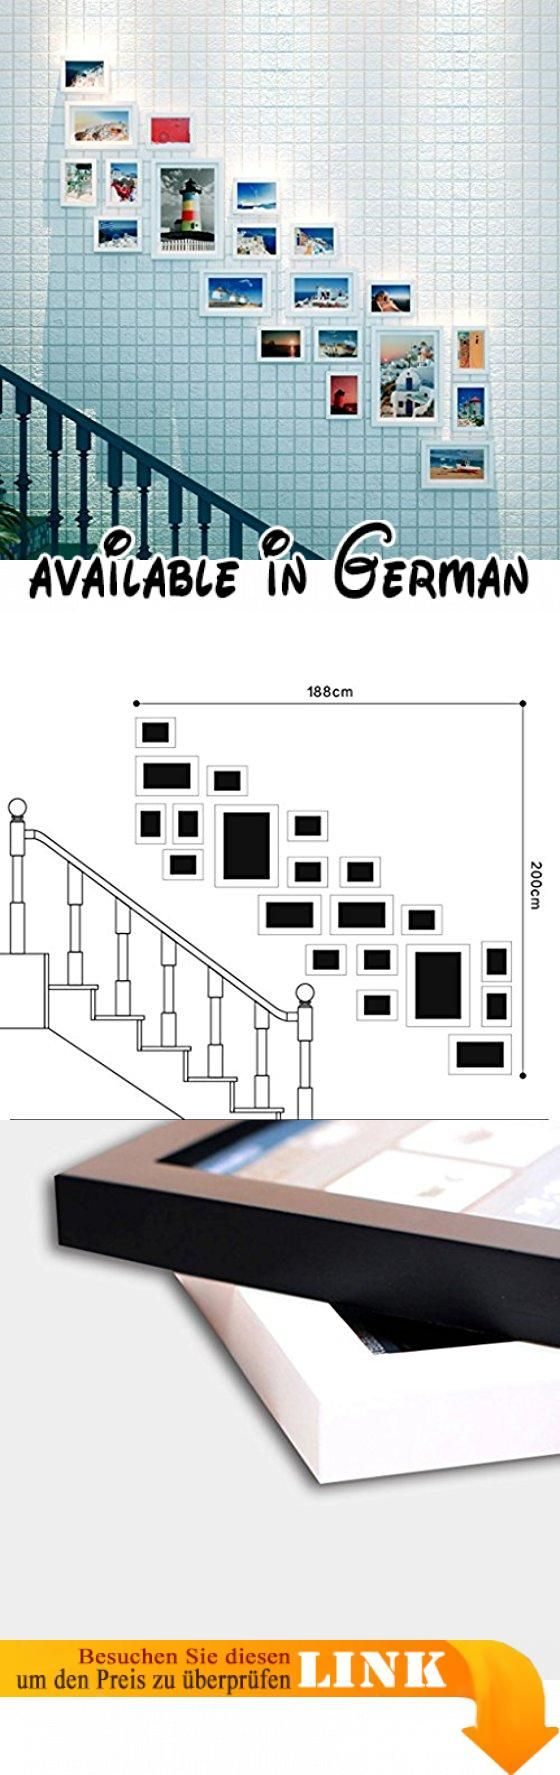 DENGJU Foto Wand Bilderrahmen Korridor Schlafzimmer Wohnzimmer  Handgefertigte Holzrahmen Sicherheit Eco Wall Set Bilderrahmen ( Farbe : B  ). Unsereu2026